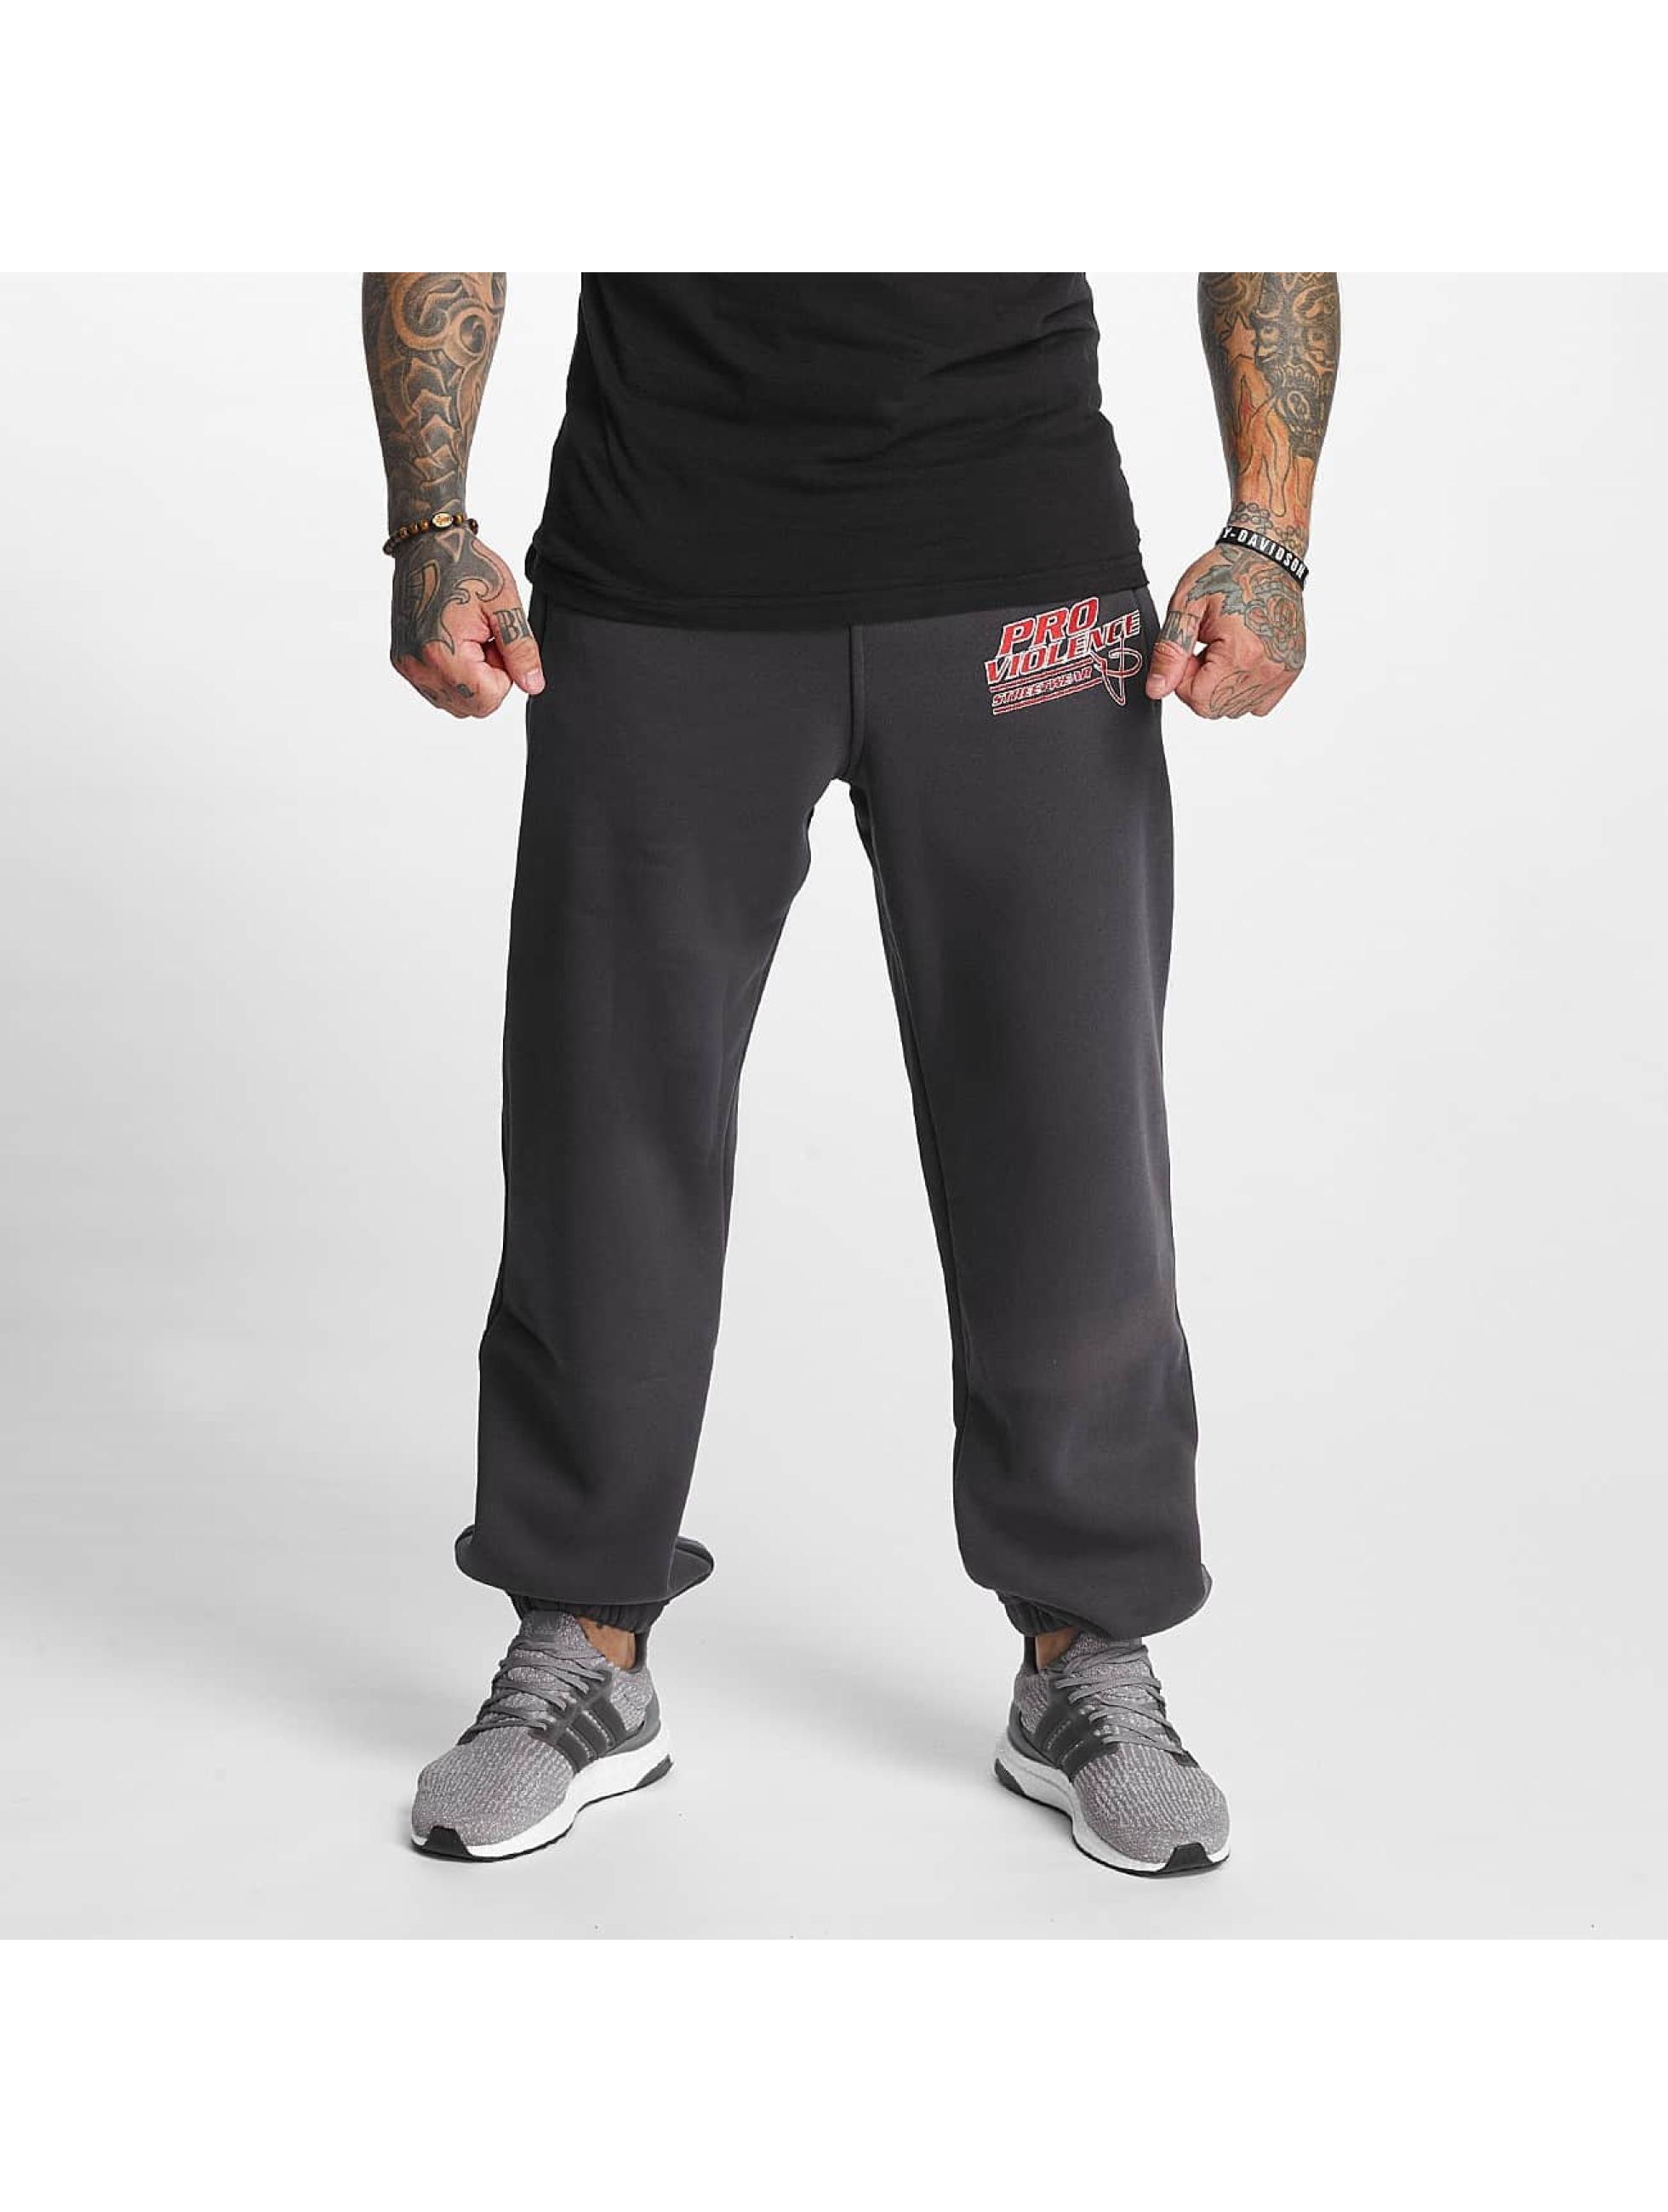 Pro Violence Streetwear Männer Jogginghose Label No. 1 in grau